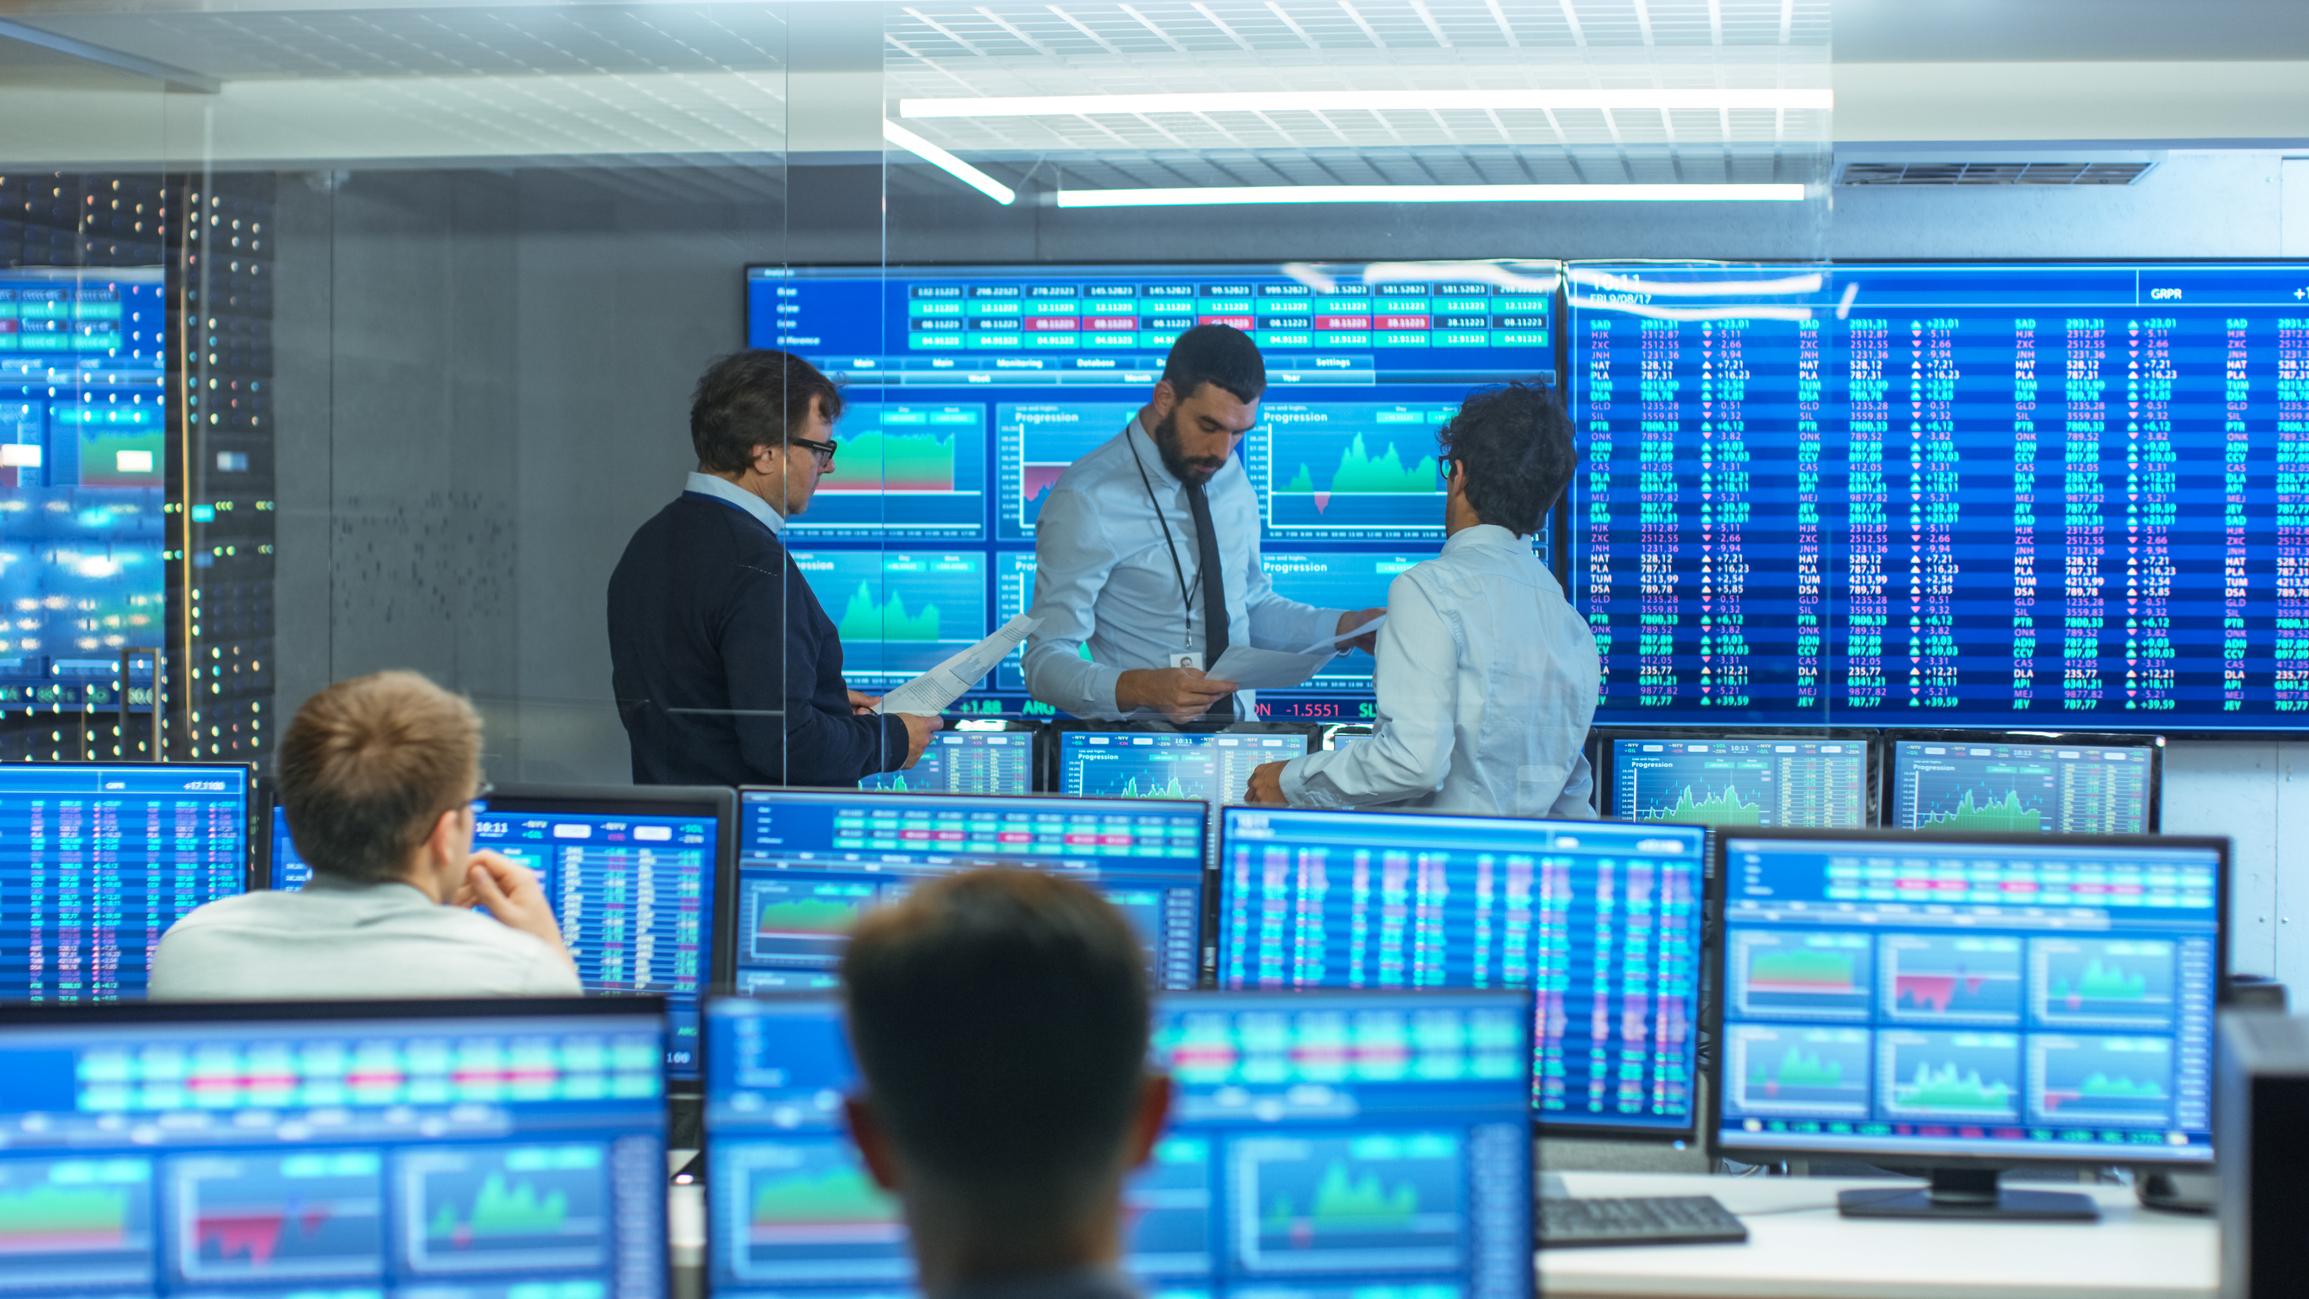 Stock traders talking in room full of monitors.